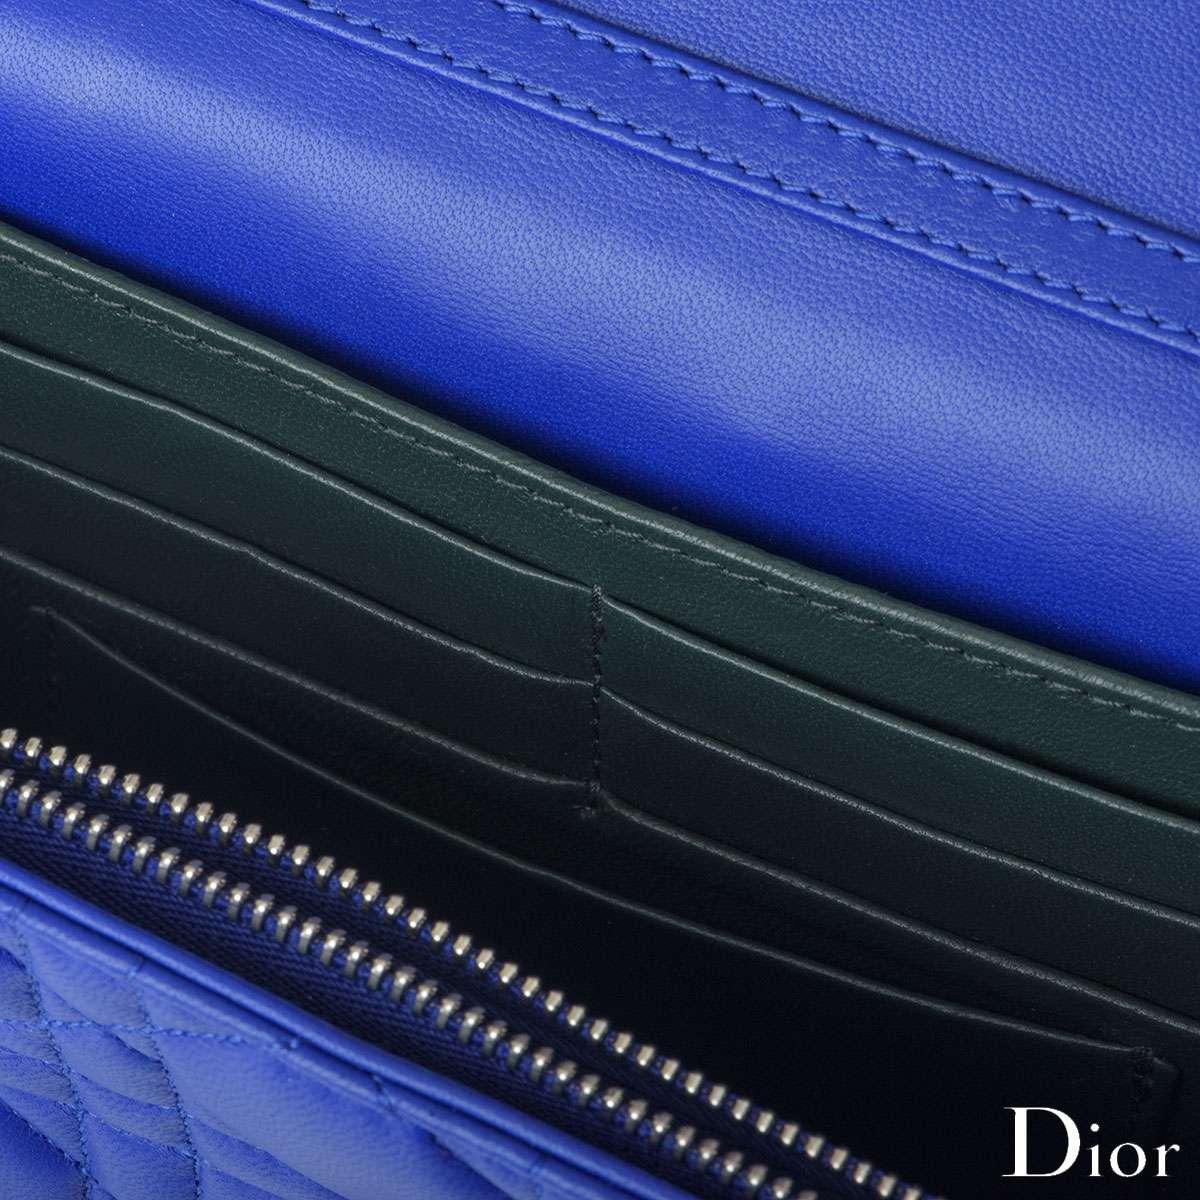 Christian Dior Miss Dior Handbag